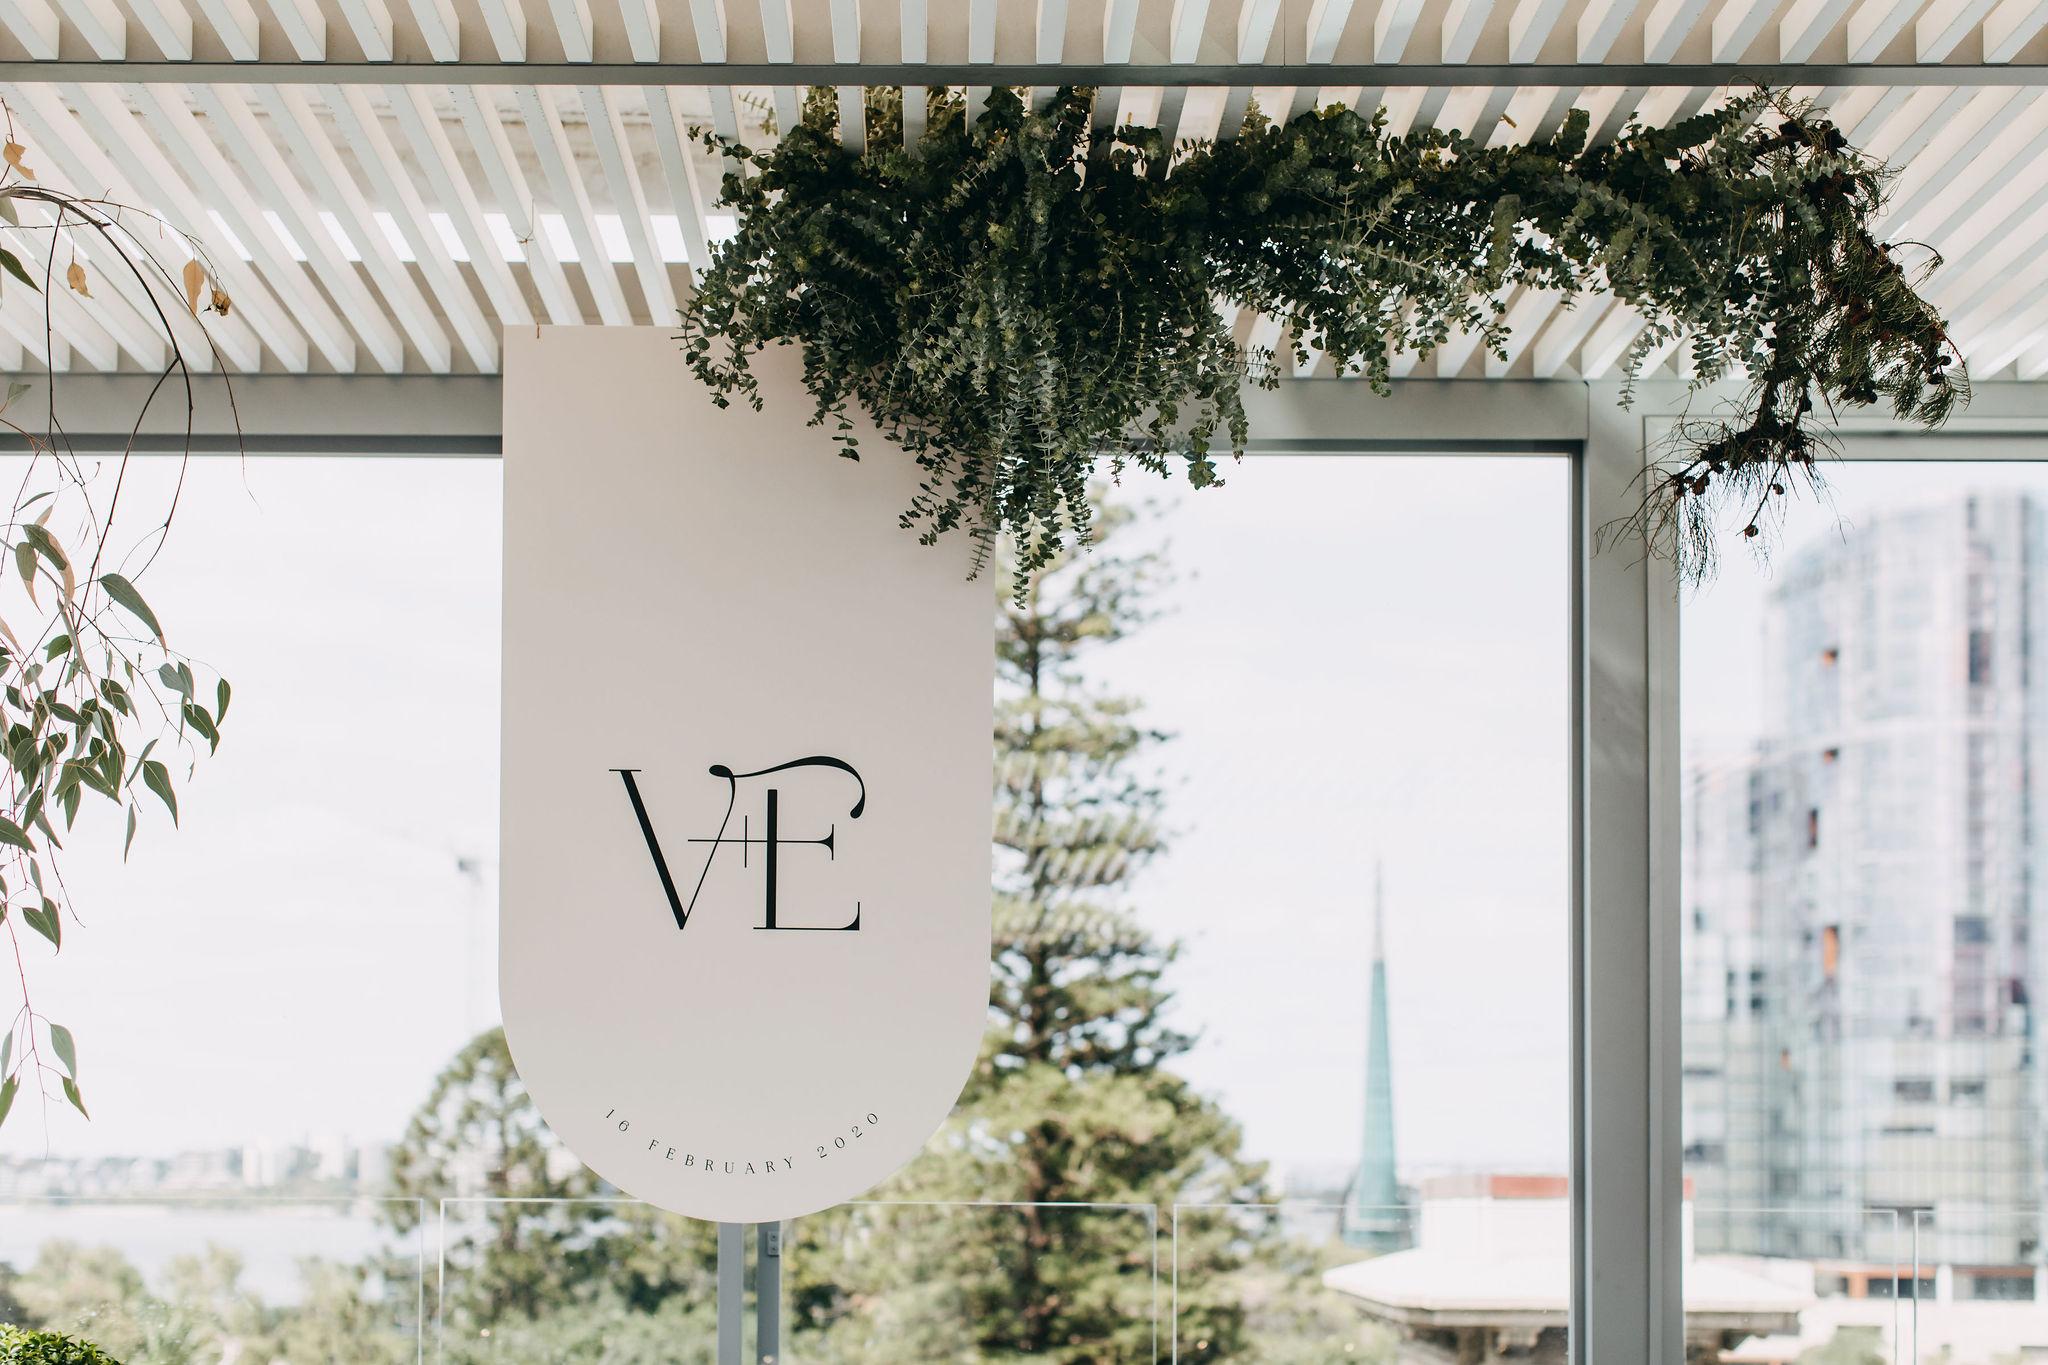 215-STATEBUILDINGS-WEDDINGOPENDAY-16FEB2020